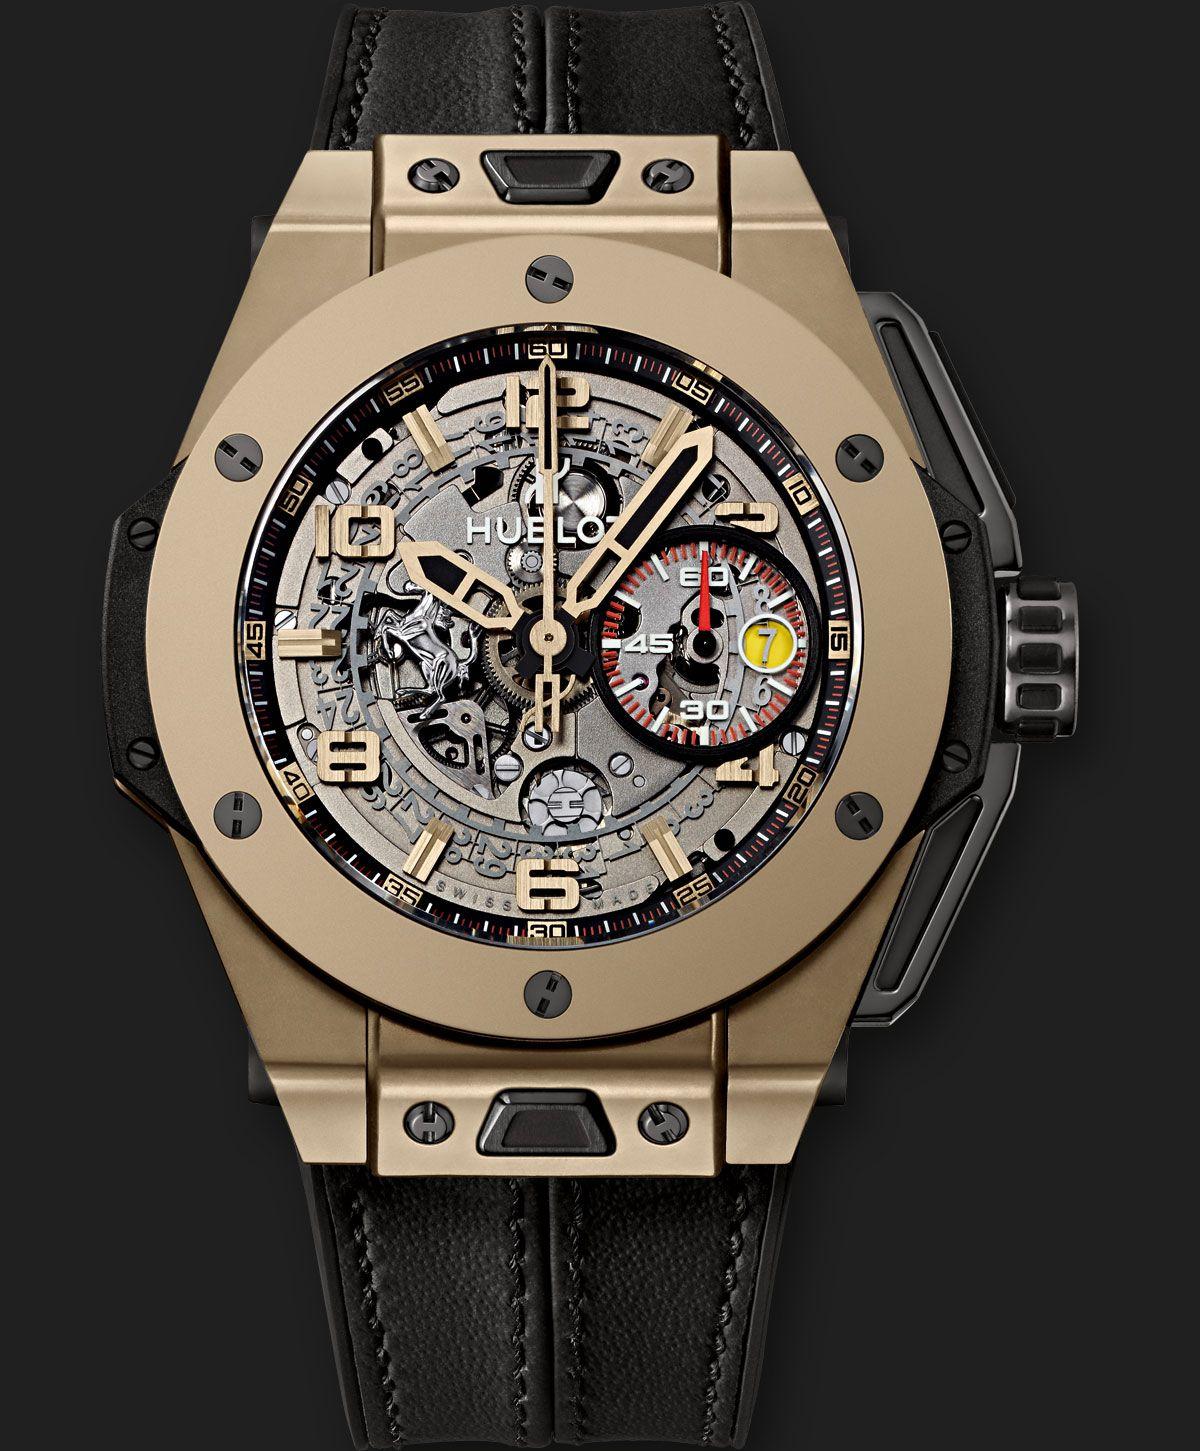 watches shade smart scuderia shipping sale for watch free ferrari designer